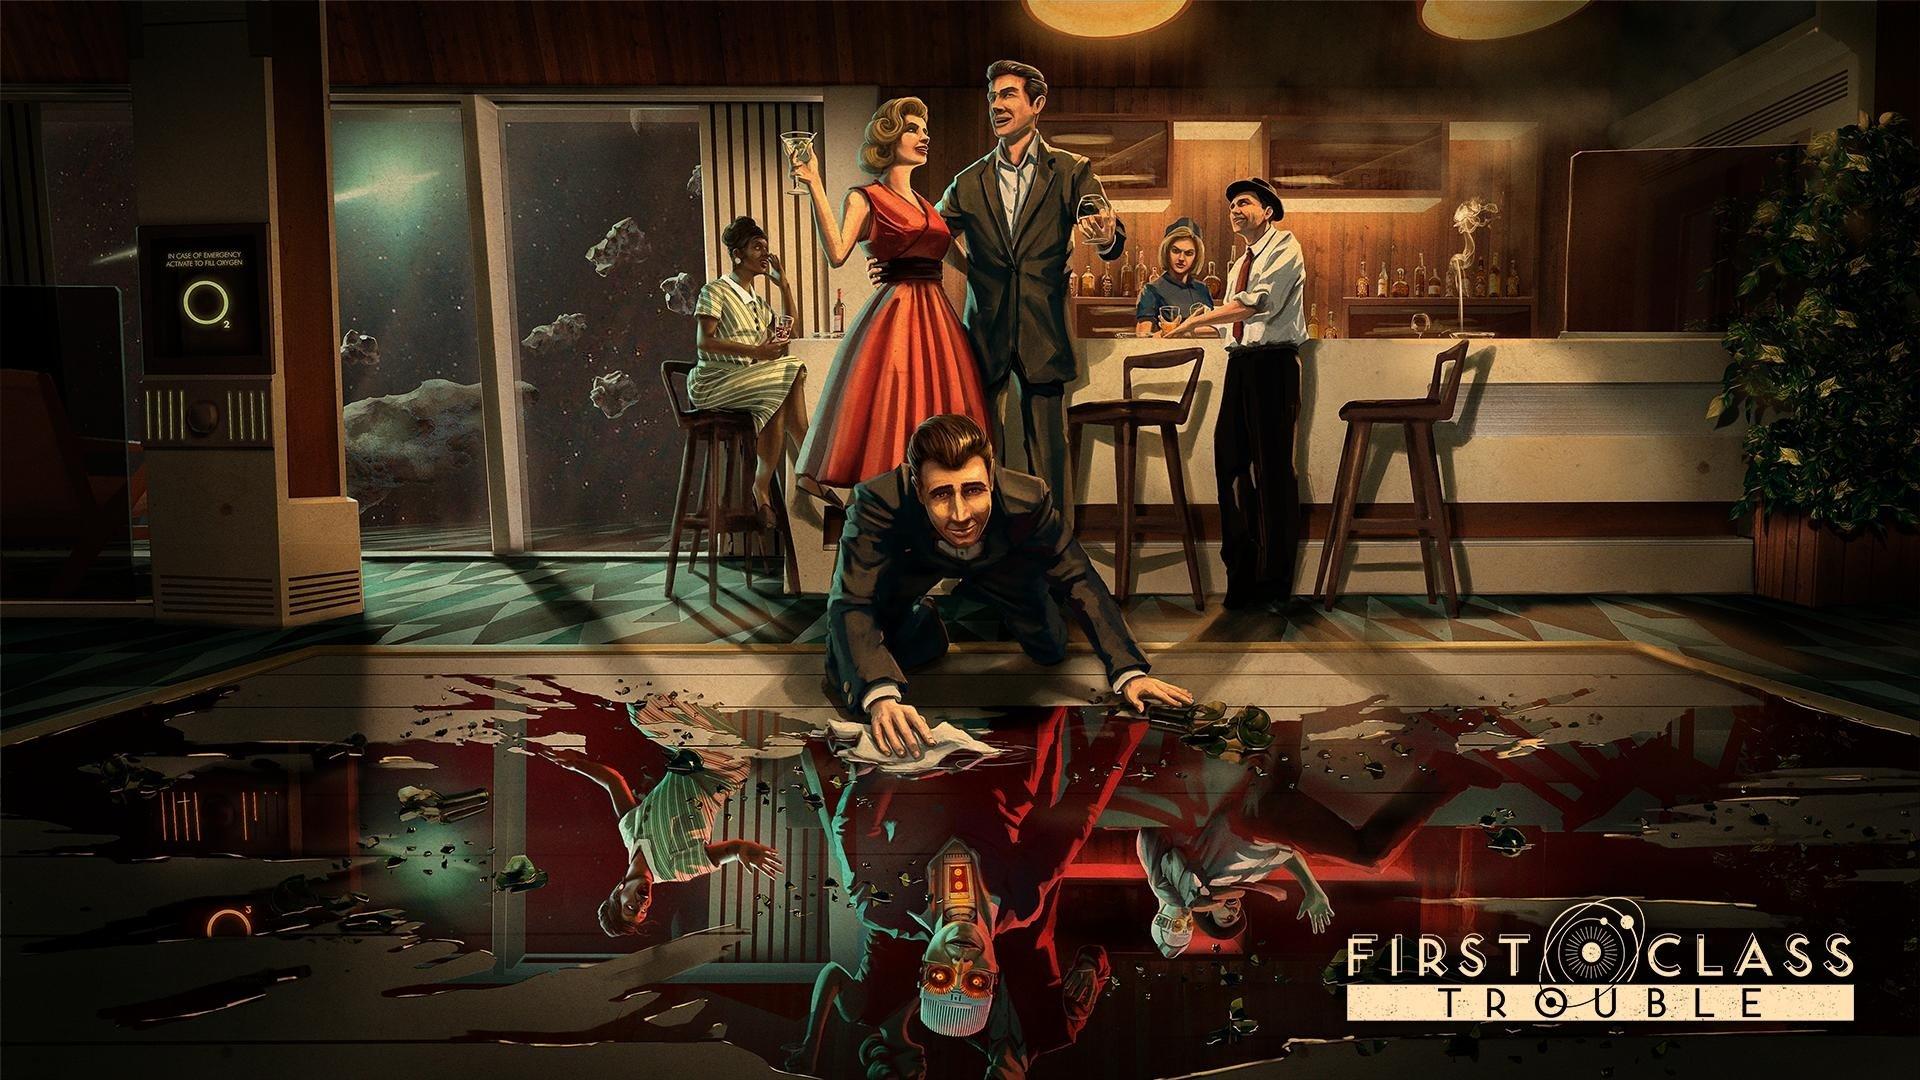 First Class Trouble PS5-versie aangekondigd